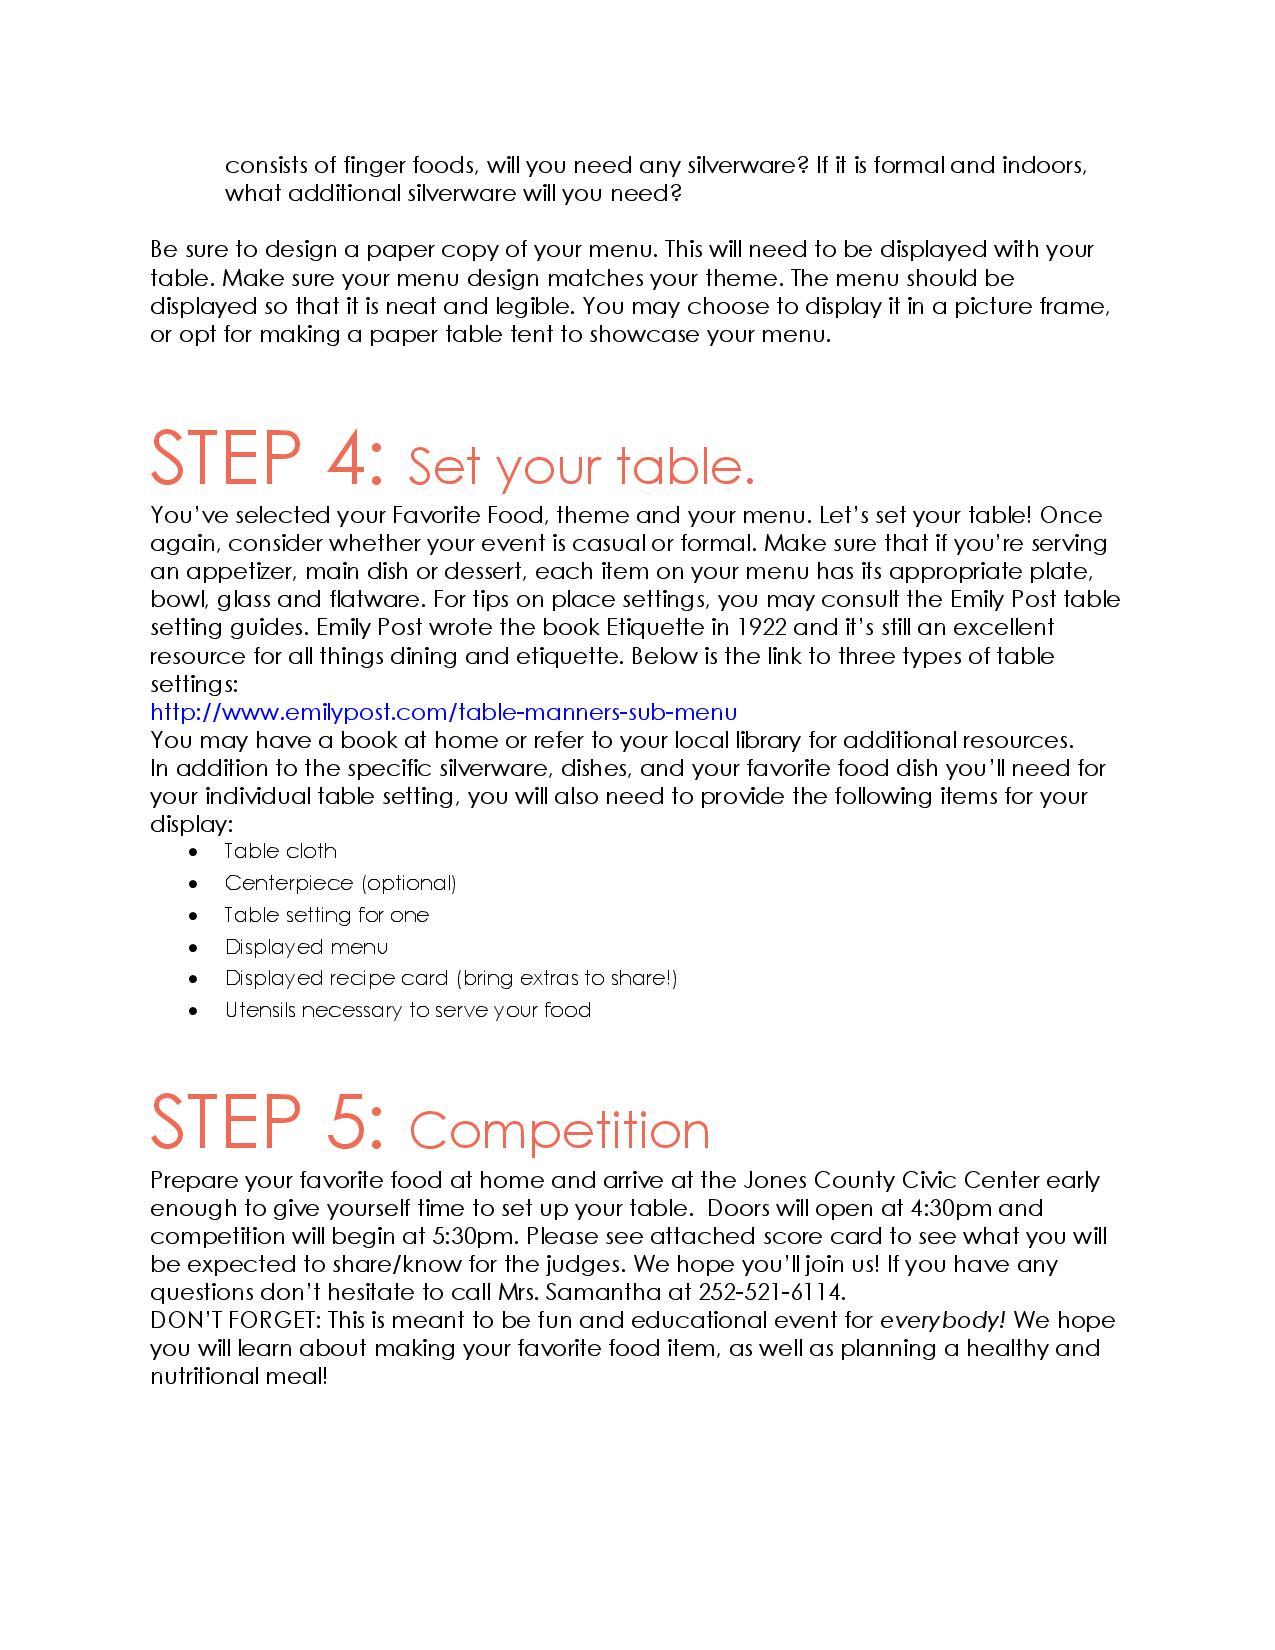 Favorite Foods Shoe Handbook page 3 image